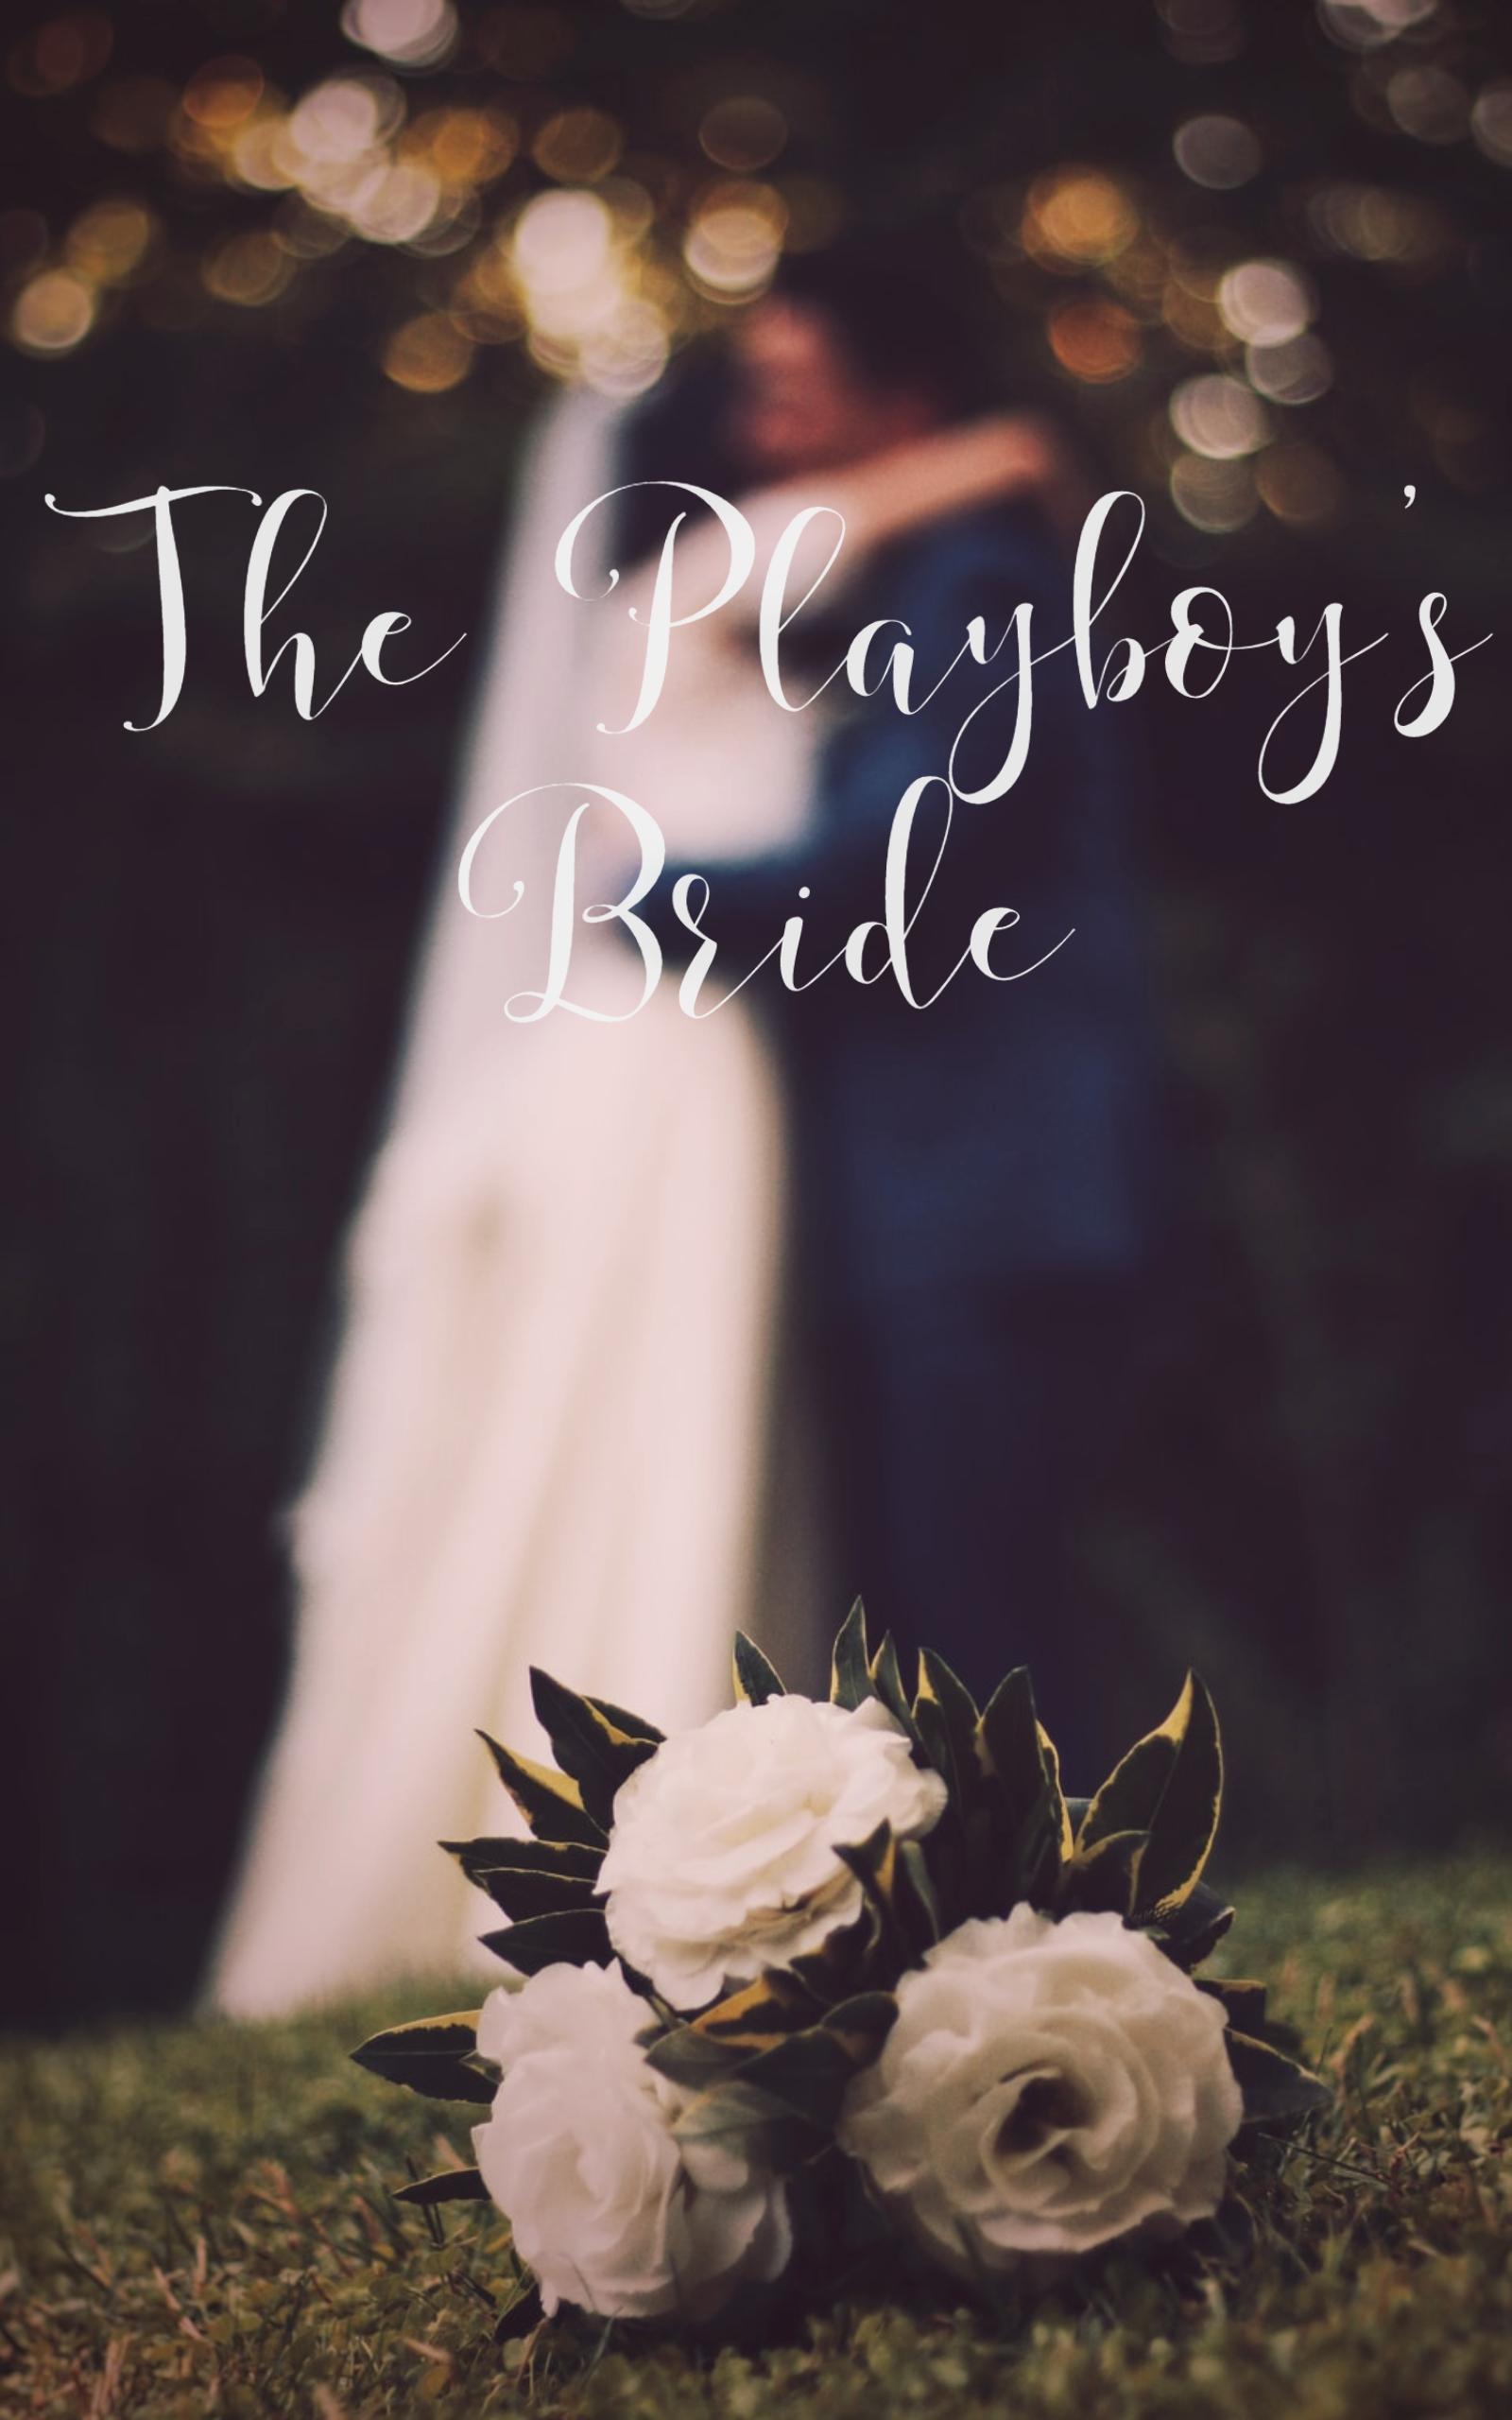 The Playboy's Bride